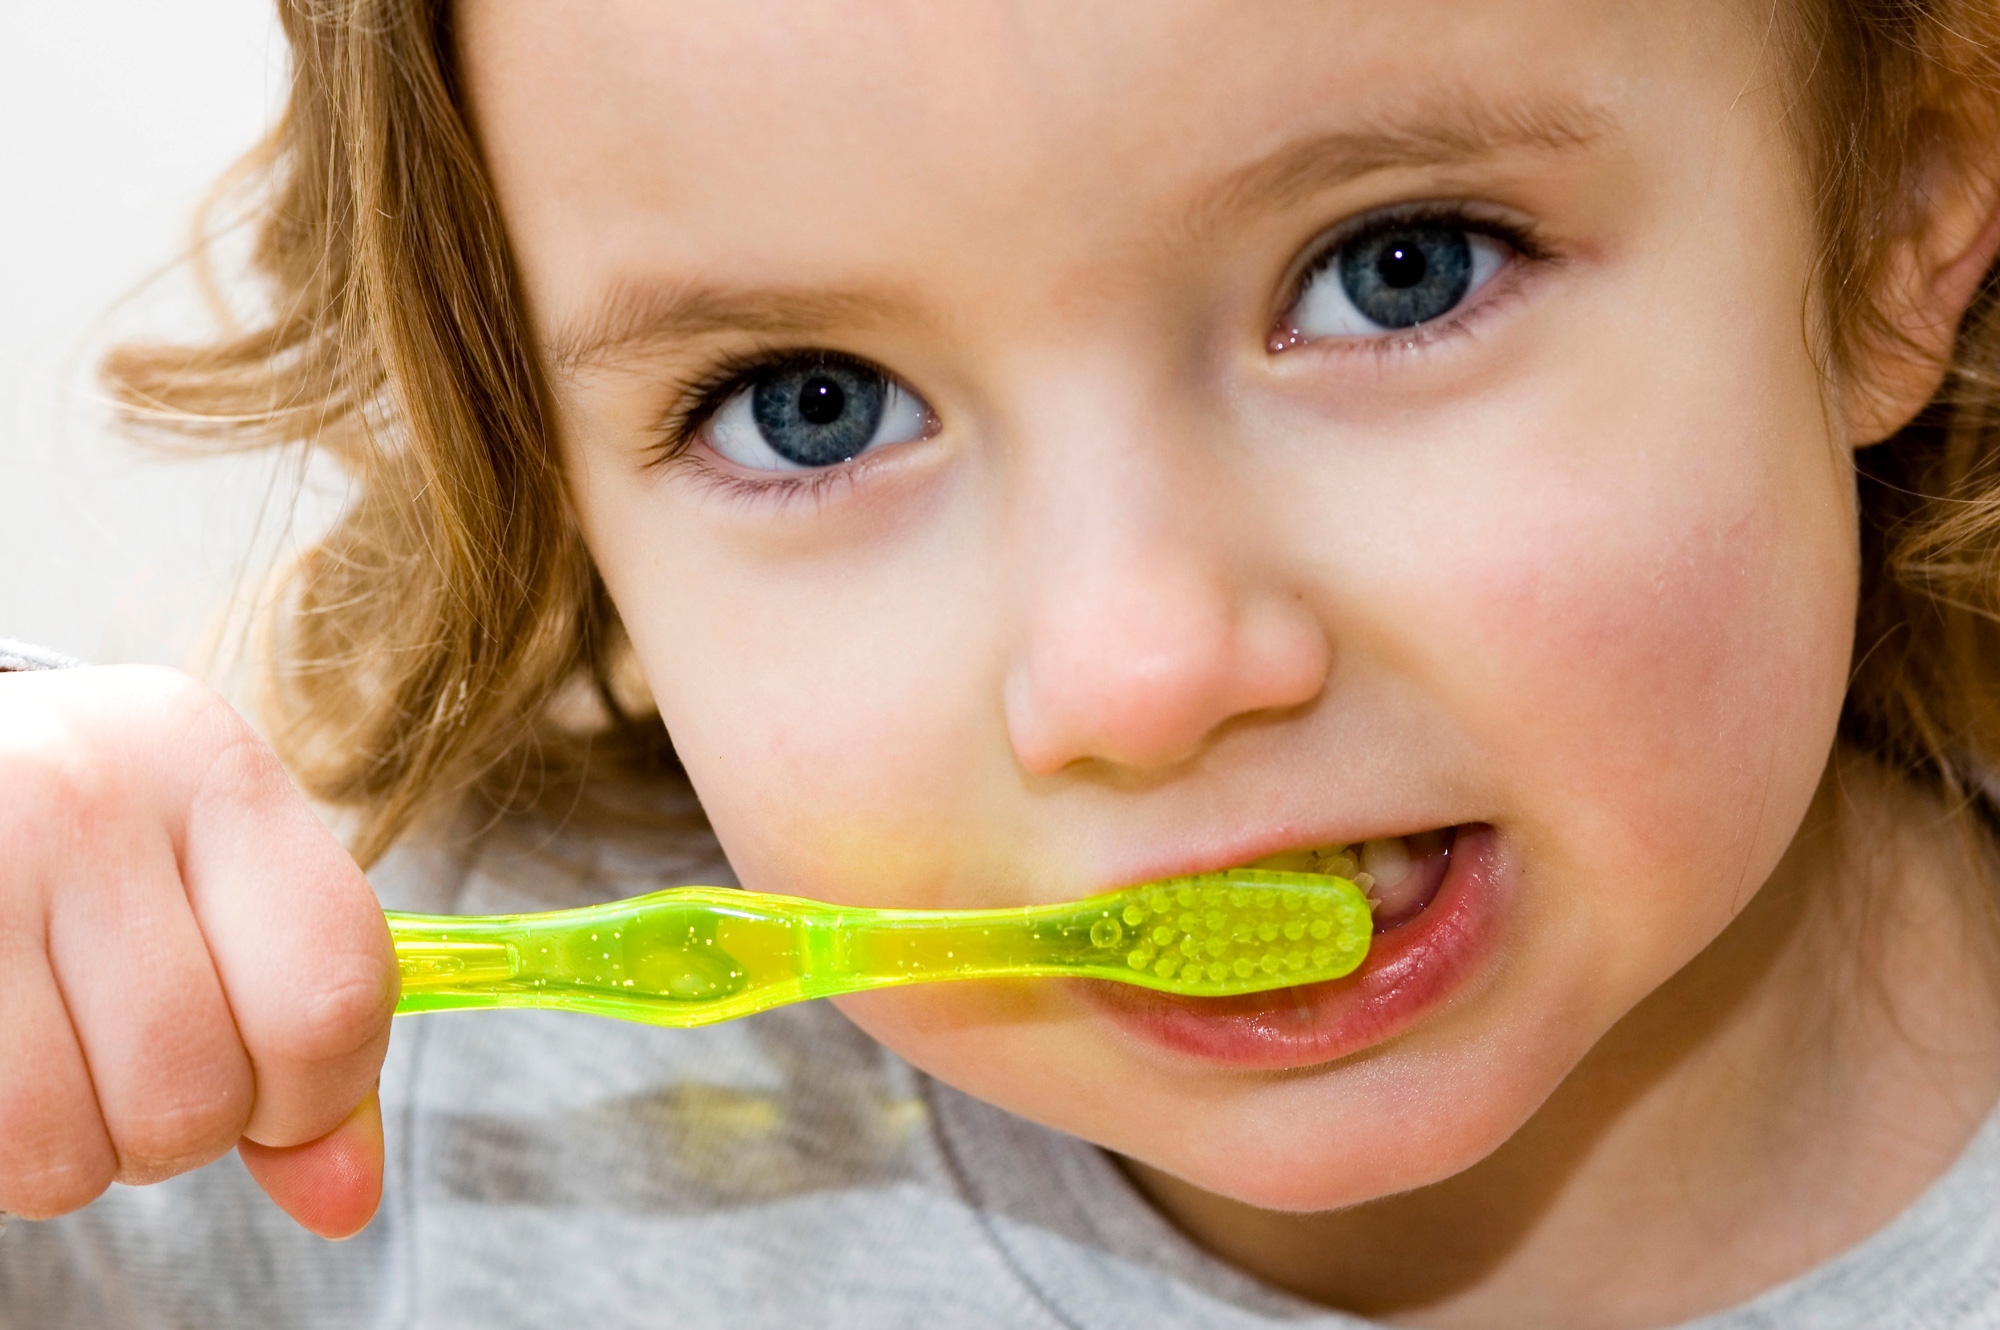 Depositphotos_8000250_original-Girl-Brushing-Preventive-